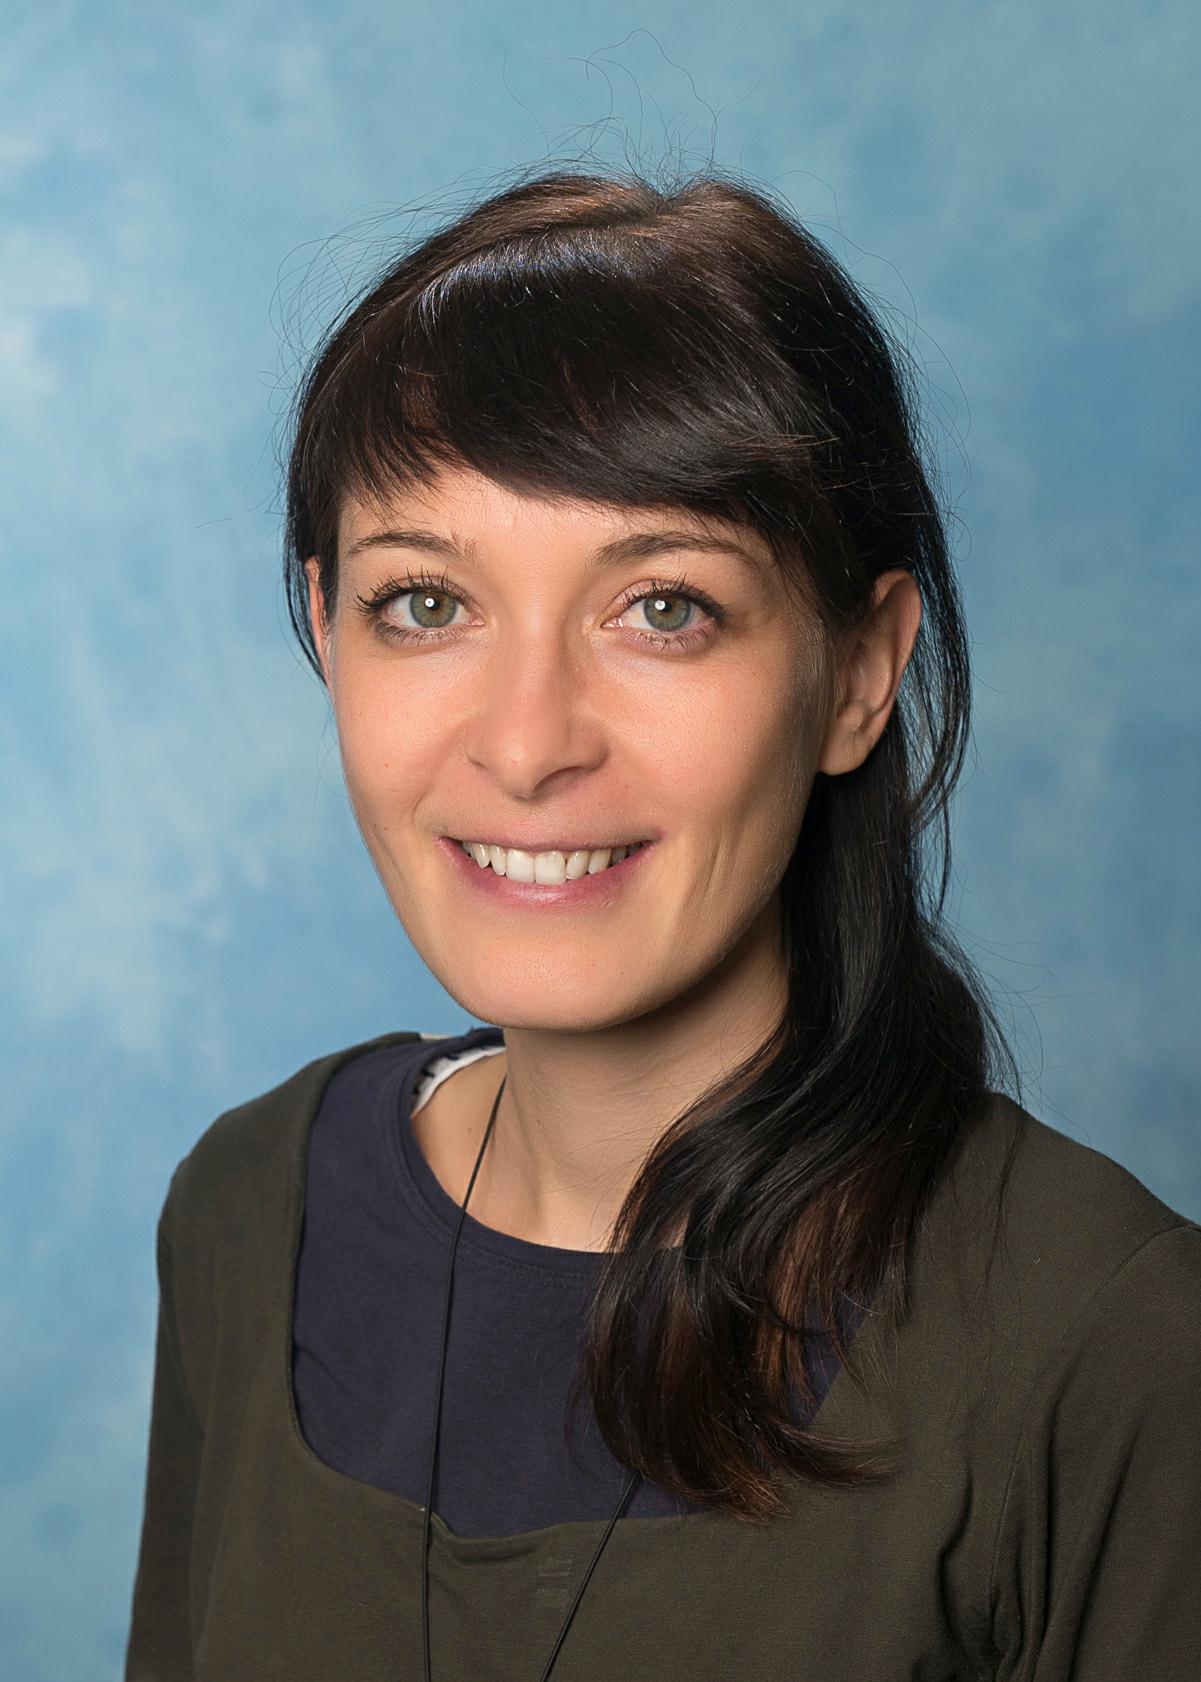 Michaela Maria Tanzer